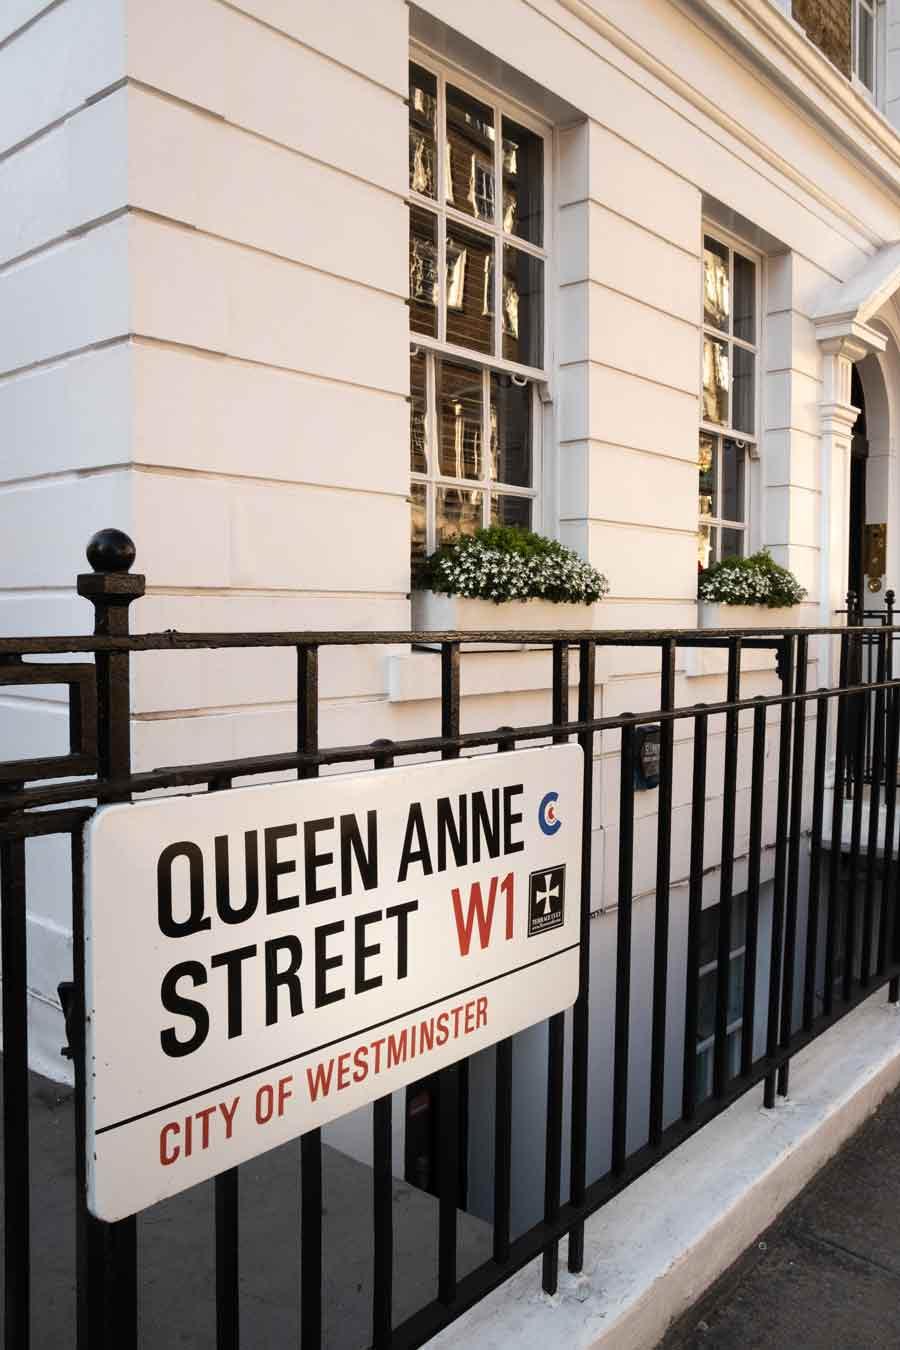 Queen Anne street